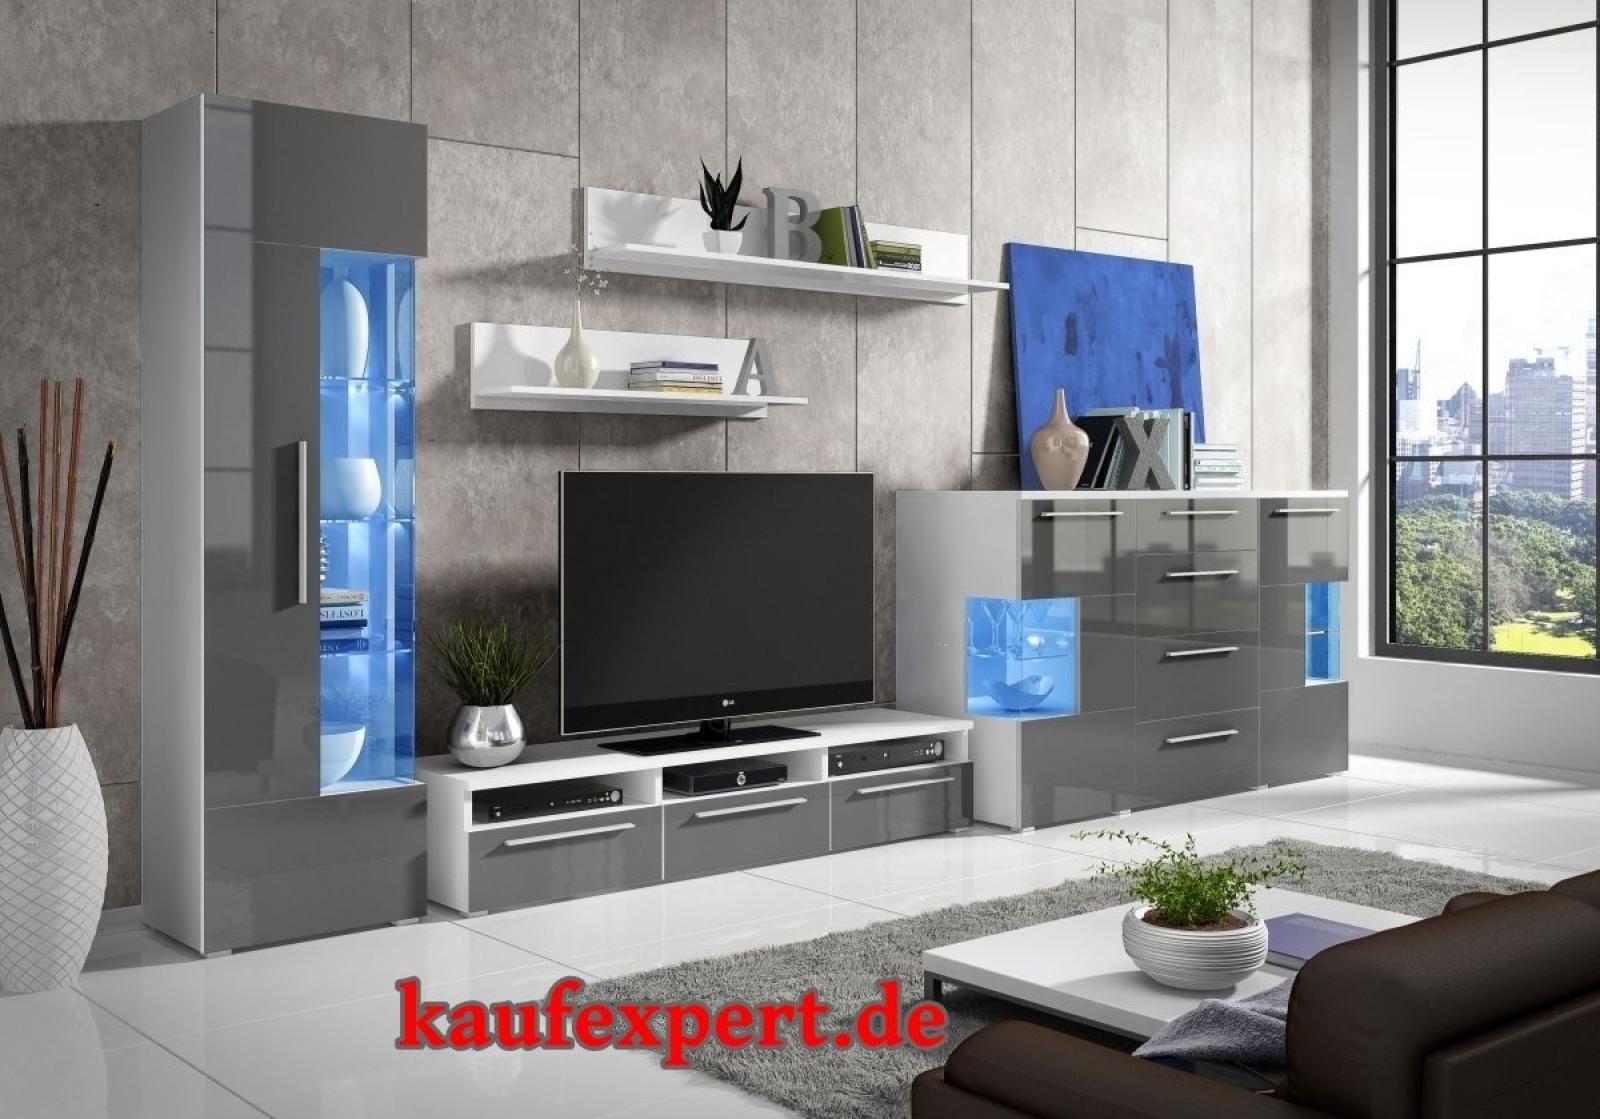 Kaufexpert Wohnwand Roma 350cm Grau Hochglanz Mit Kommode